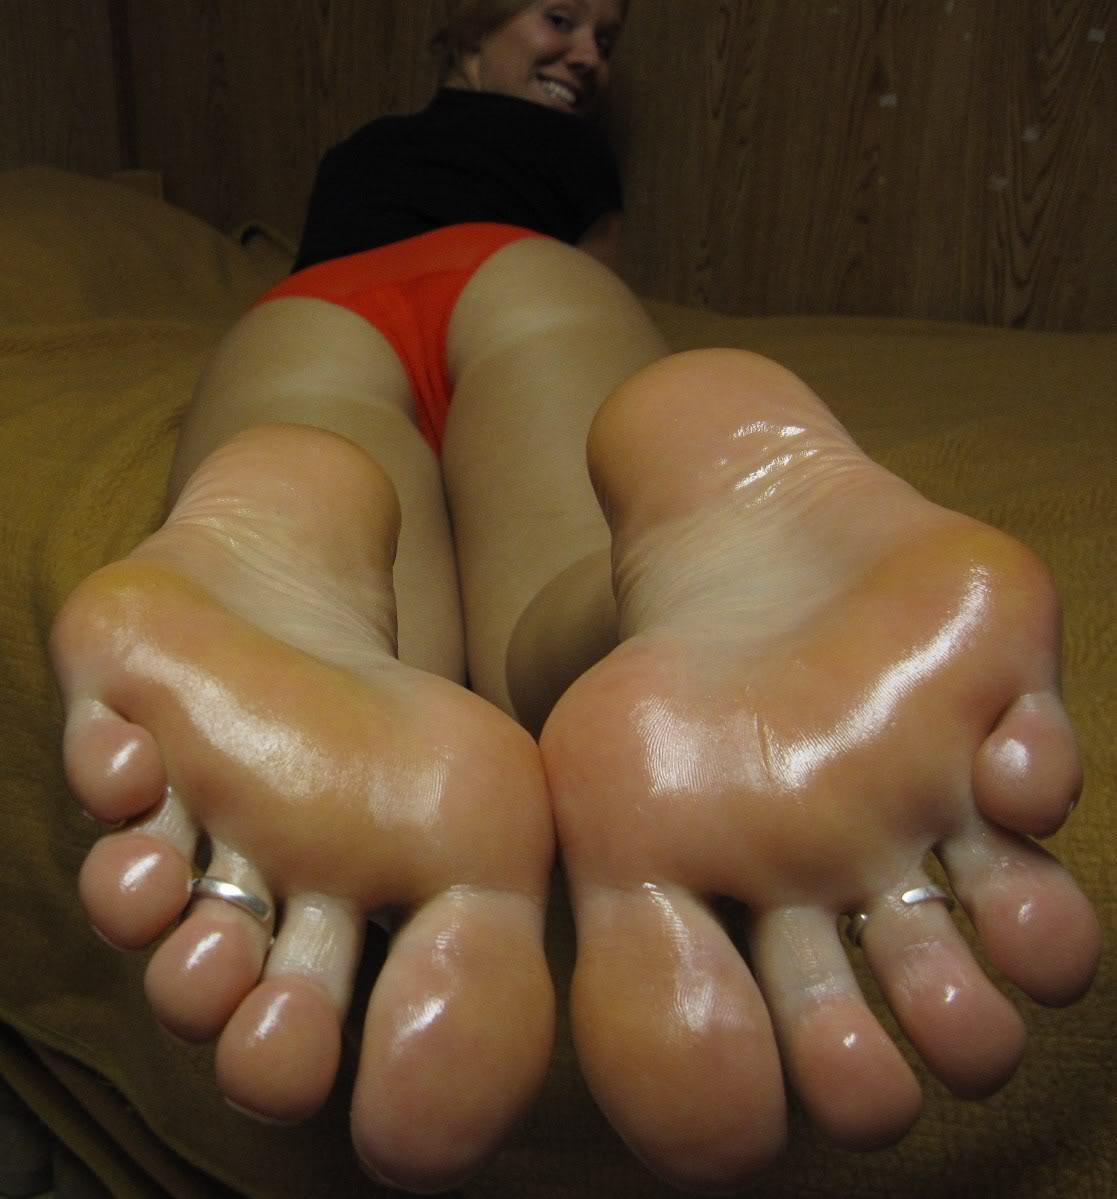 Feet. Free porn - My Mature Granny - Mature, Granny Sex Tube